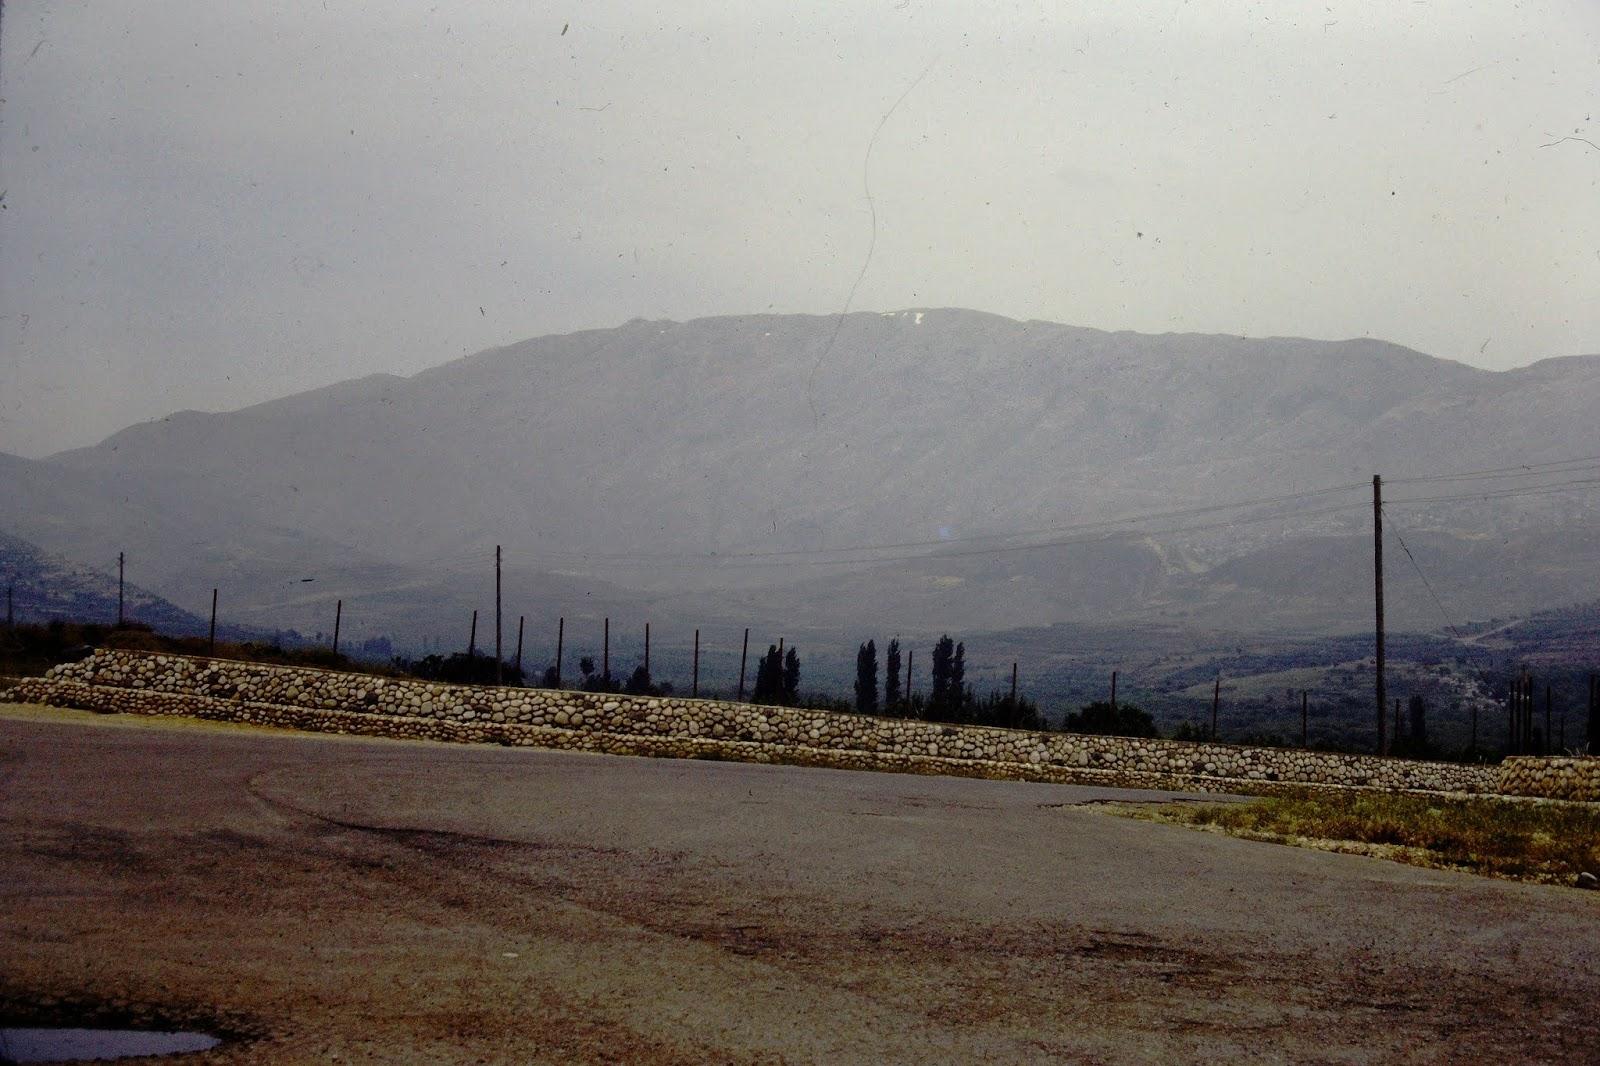 Mount Hermon - June 1982